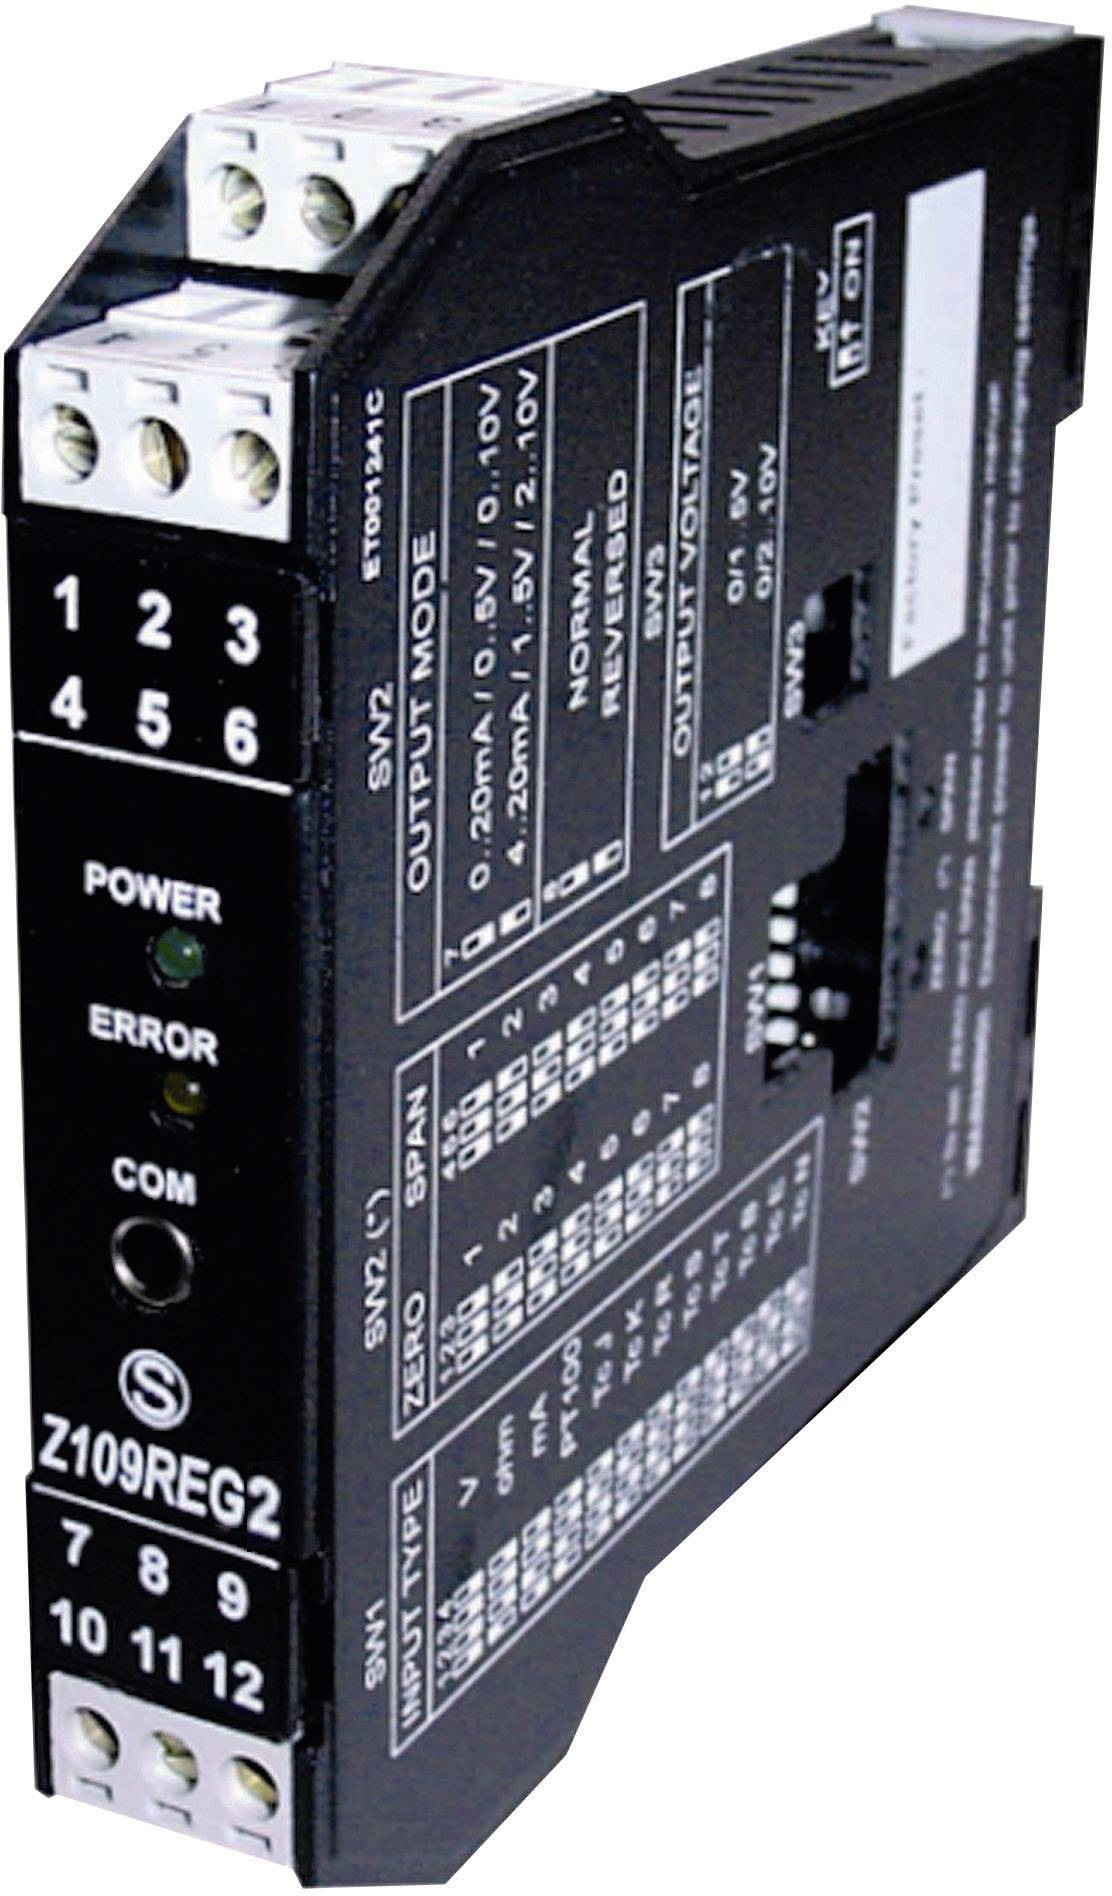 Transmiter pro Pt100/Ni100/Pt1000 Wachendorff WZ109REG2